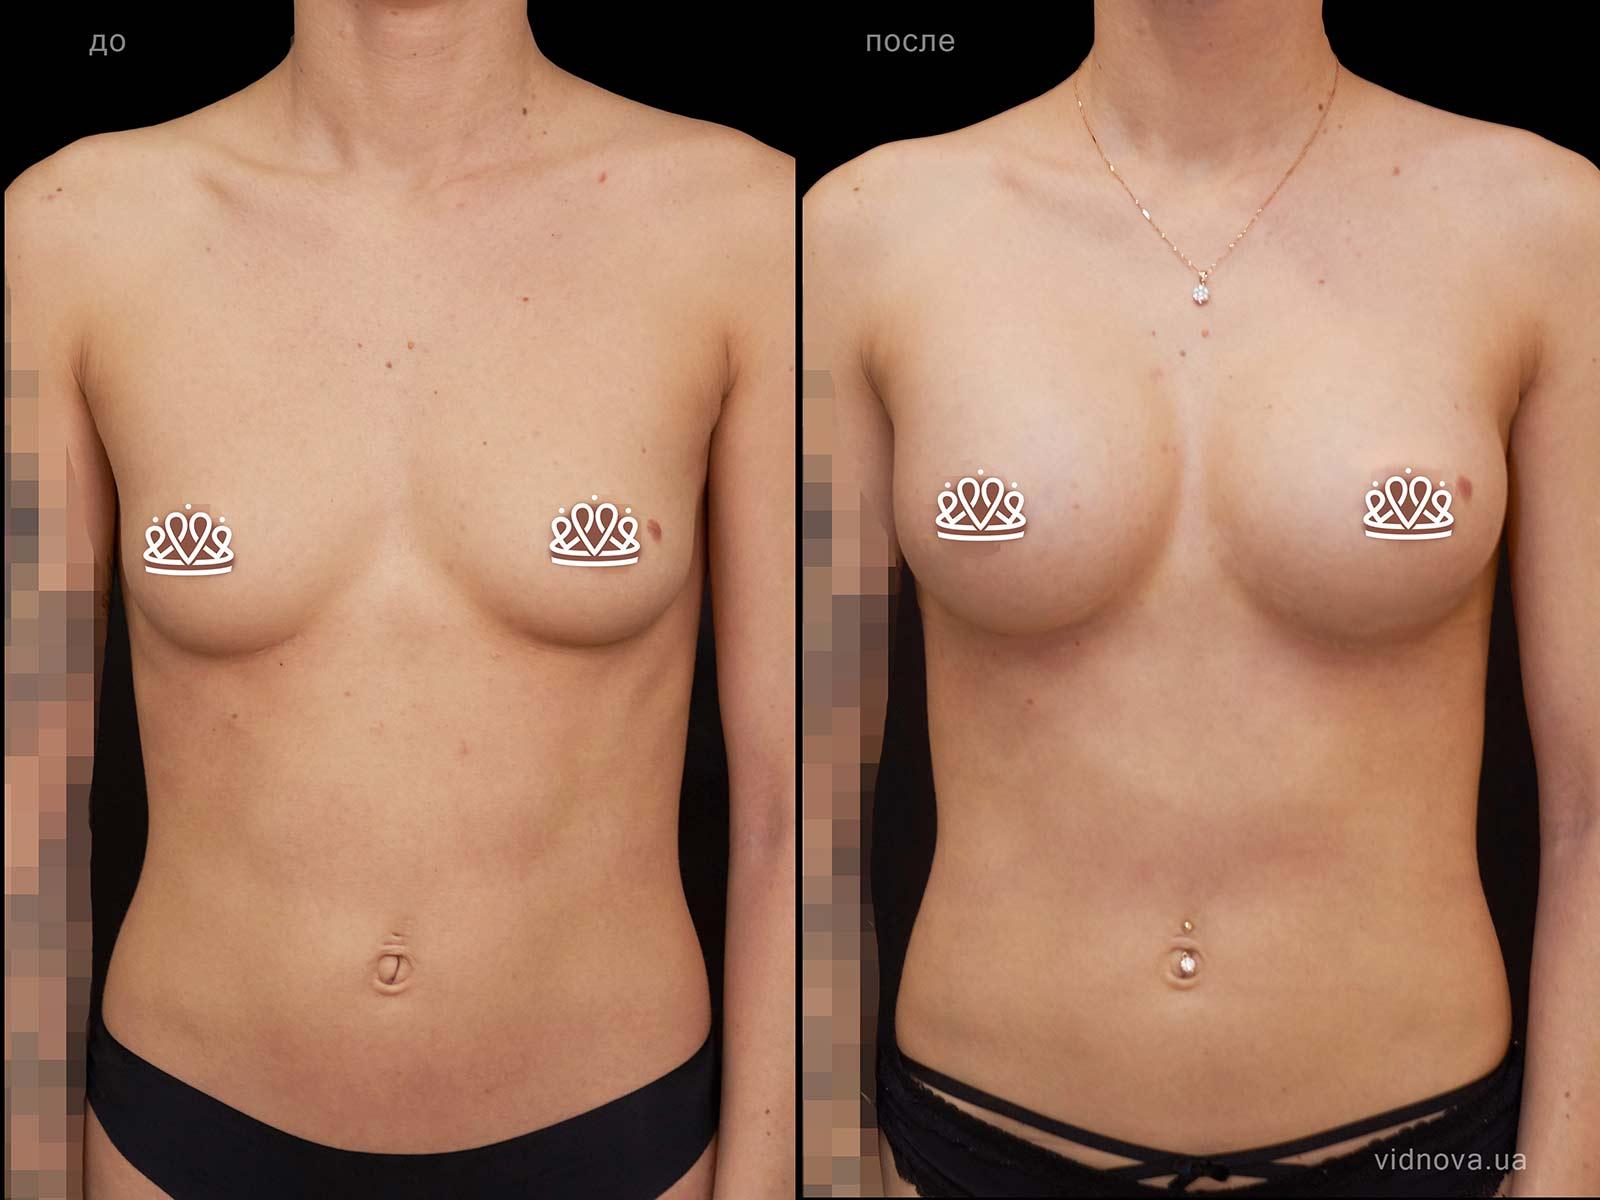 Увеличение груди maket grud rabotenko 1 s 1 1